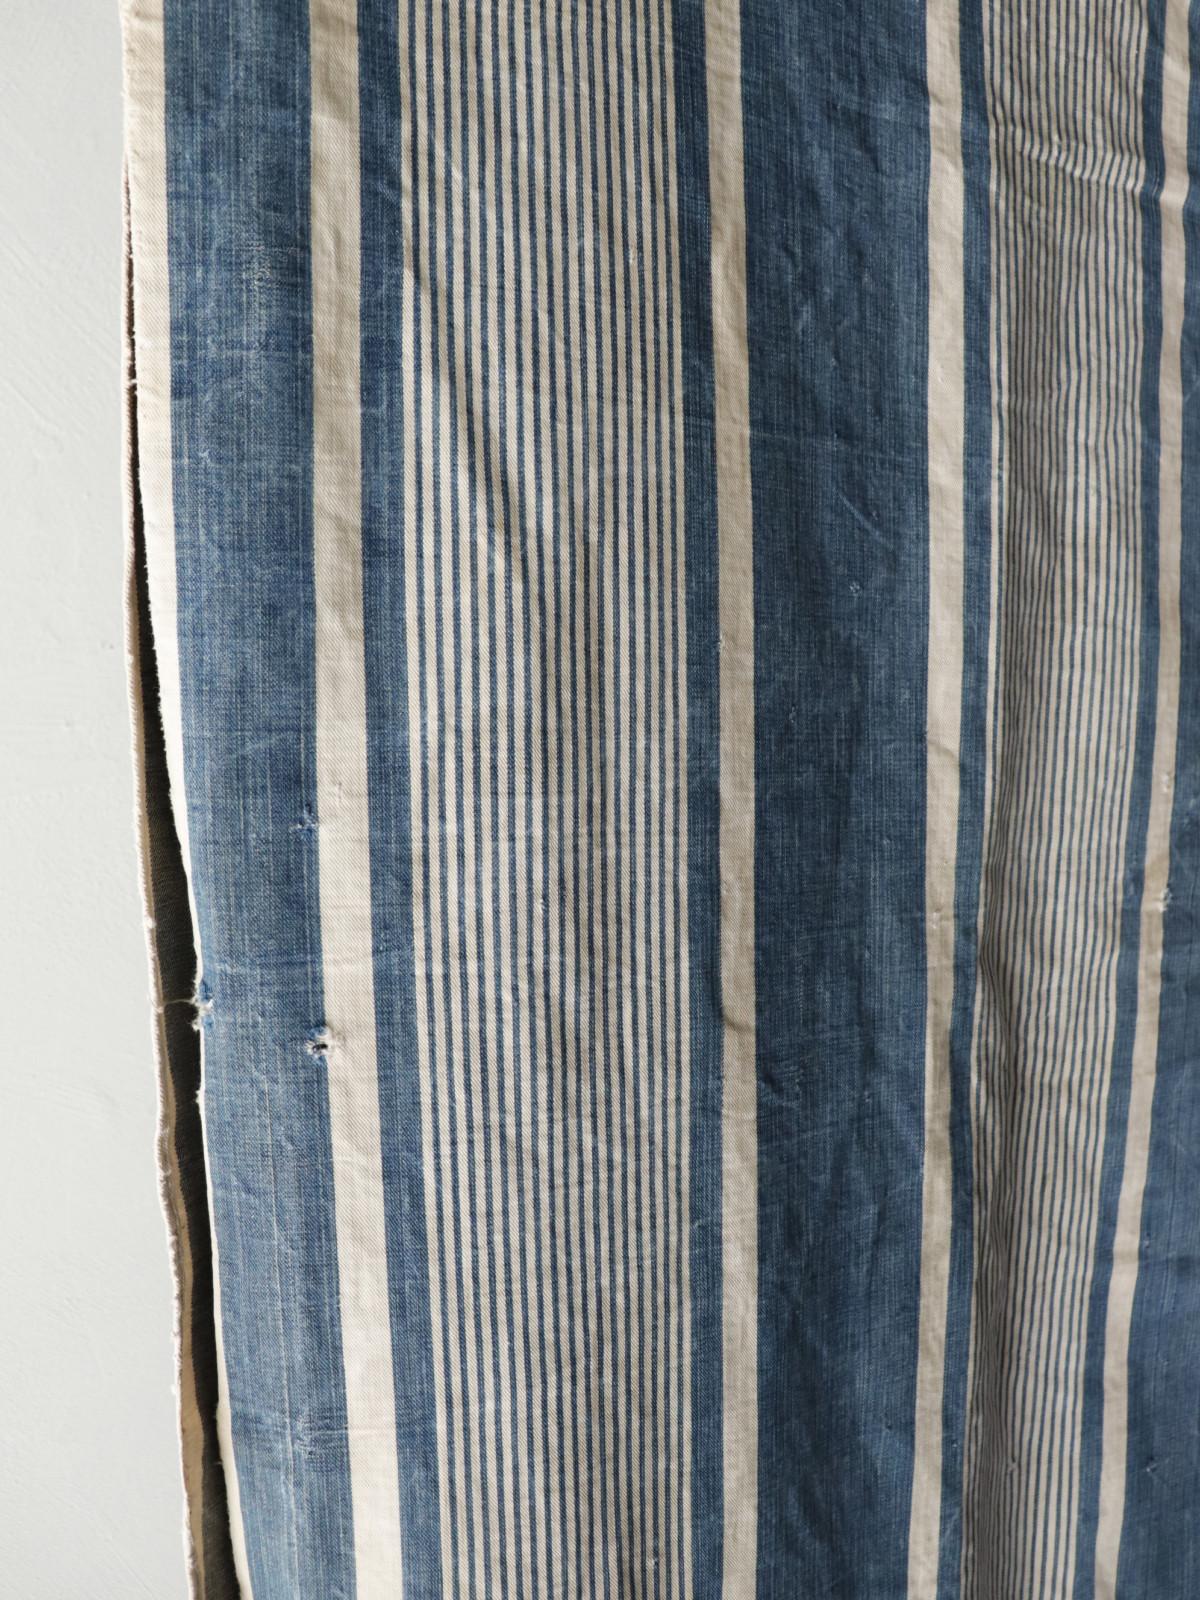 Indigo ticking cotton fabric,,France,Vintage